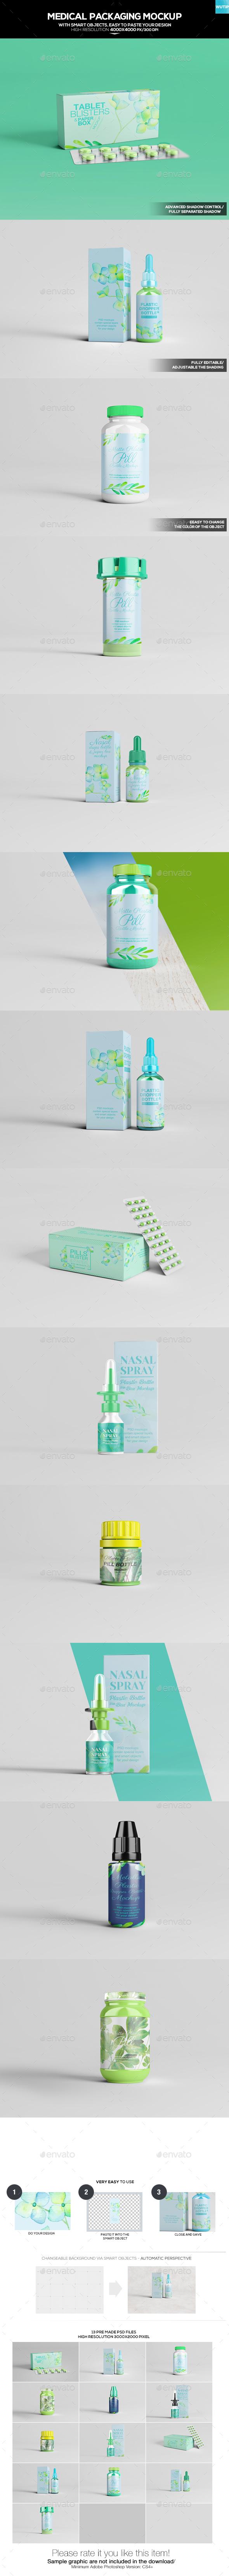 Medical Packaging Mockup